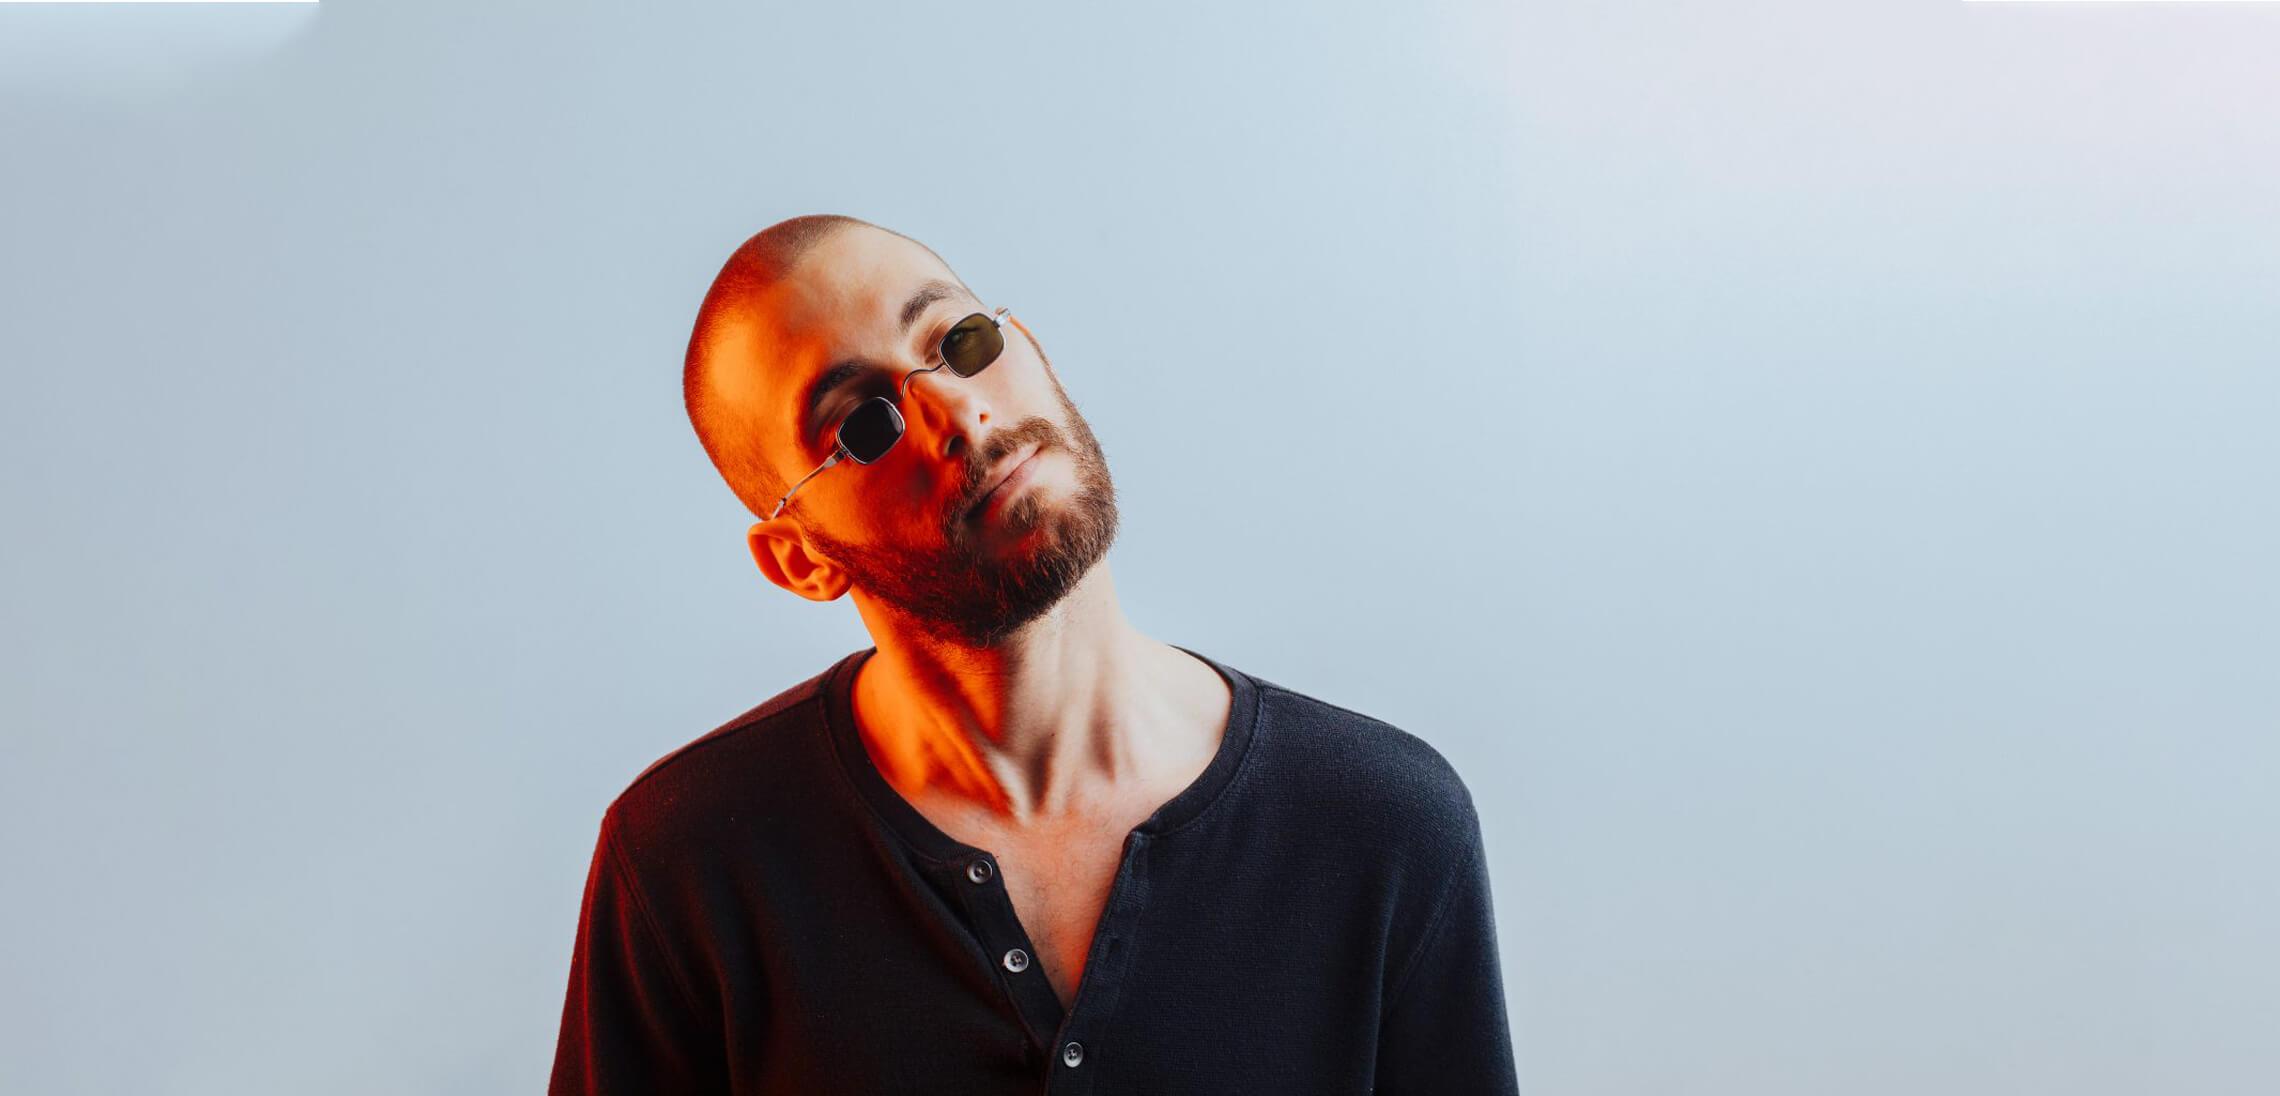 Lubelski - At Night EP hero